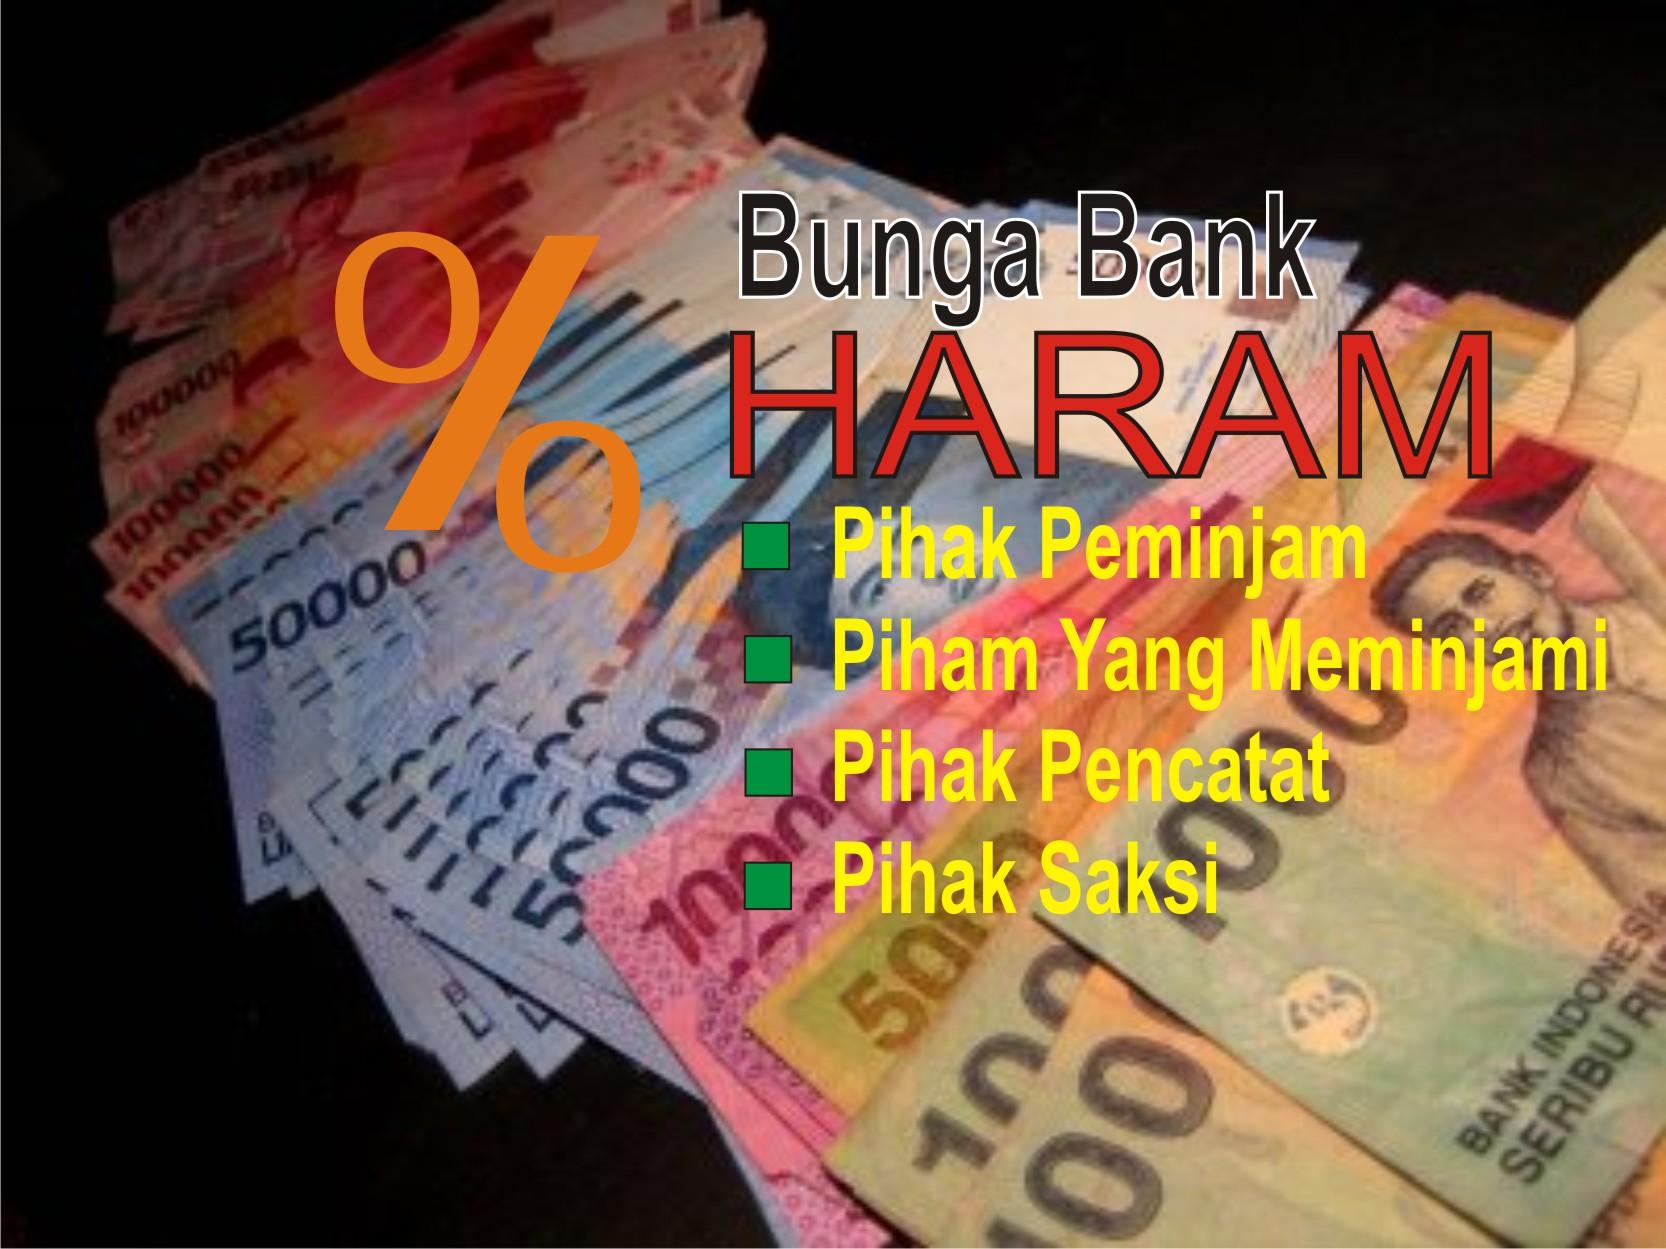 bunga bank haram 1